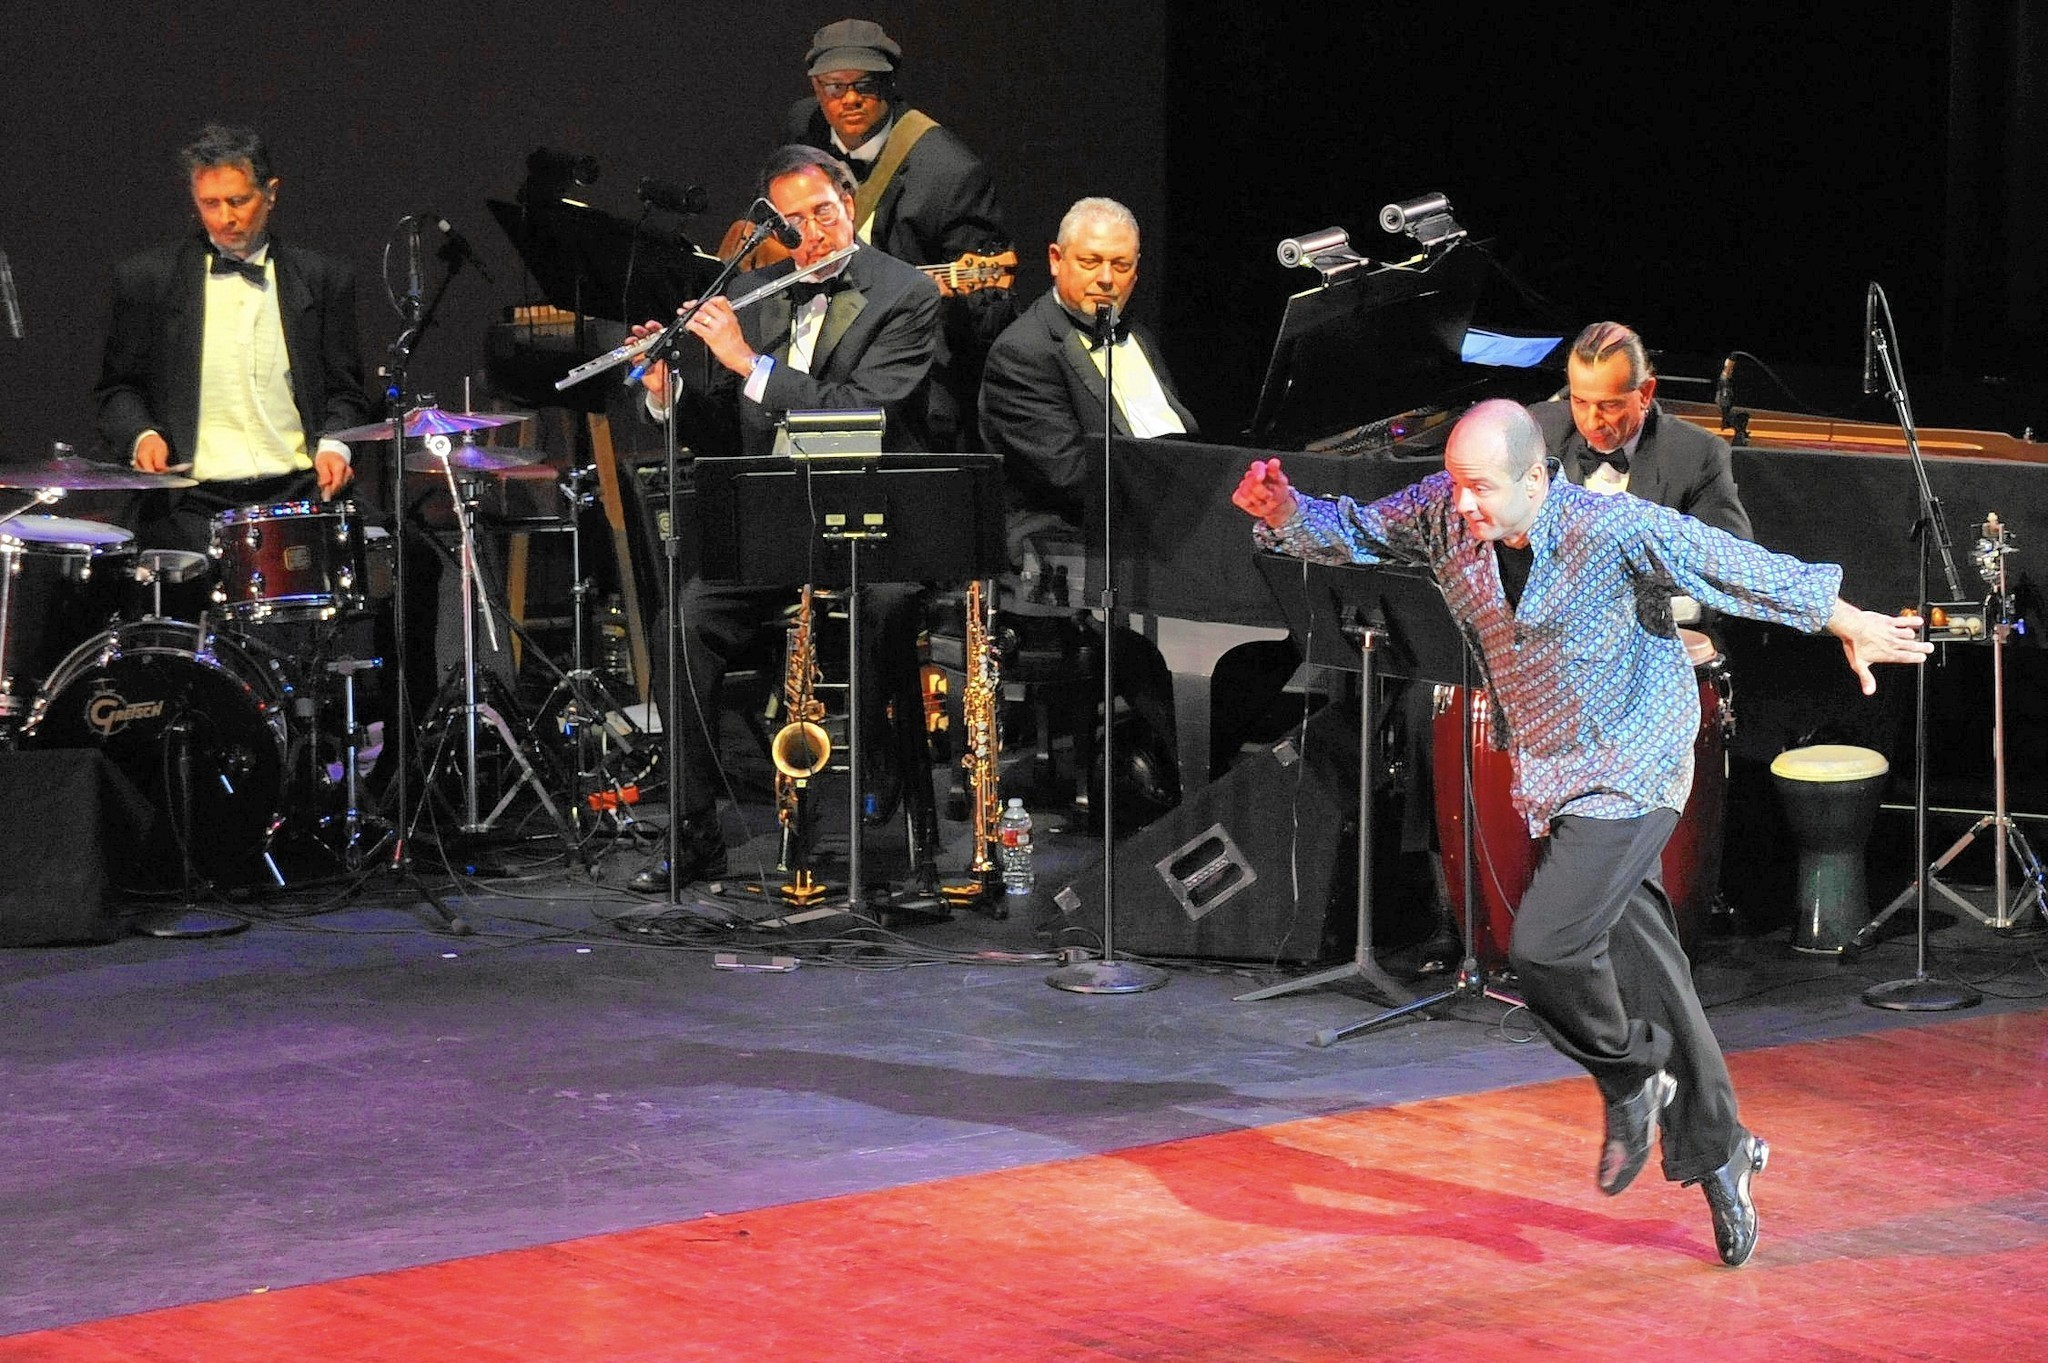 Bob Carroll dies at 48; a lauded improvisational tap dancer